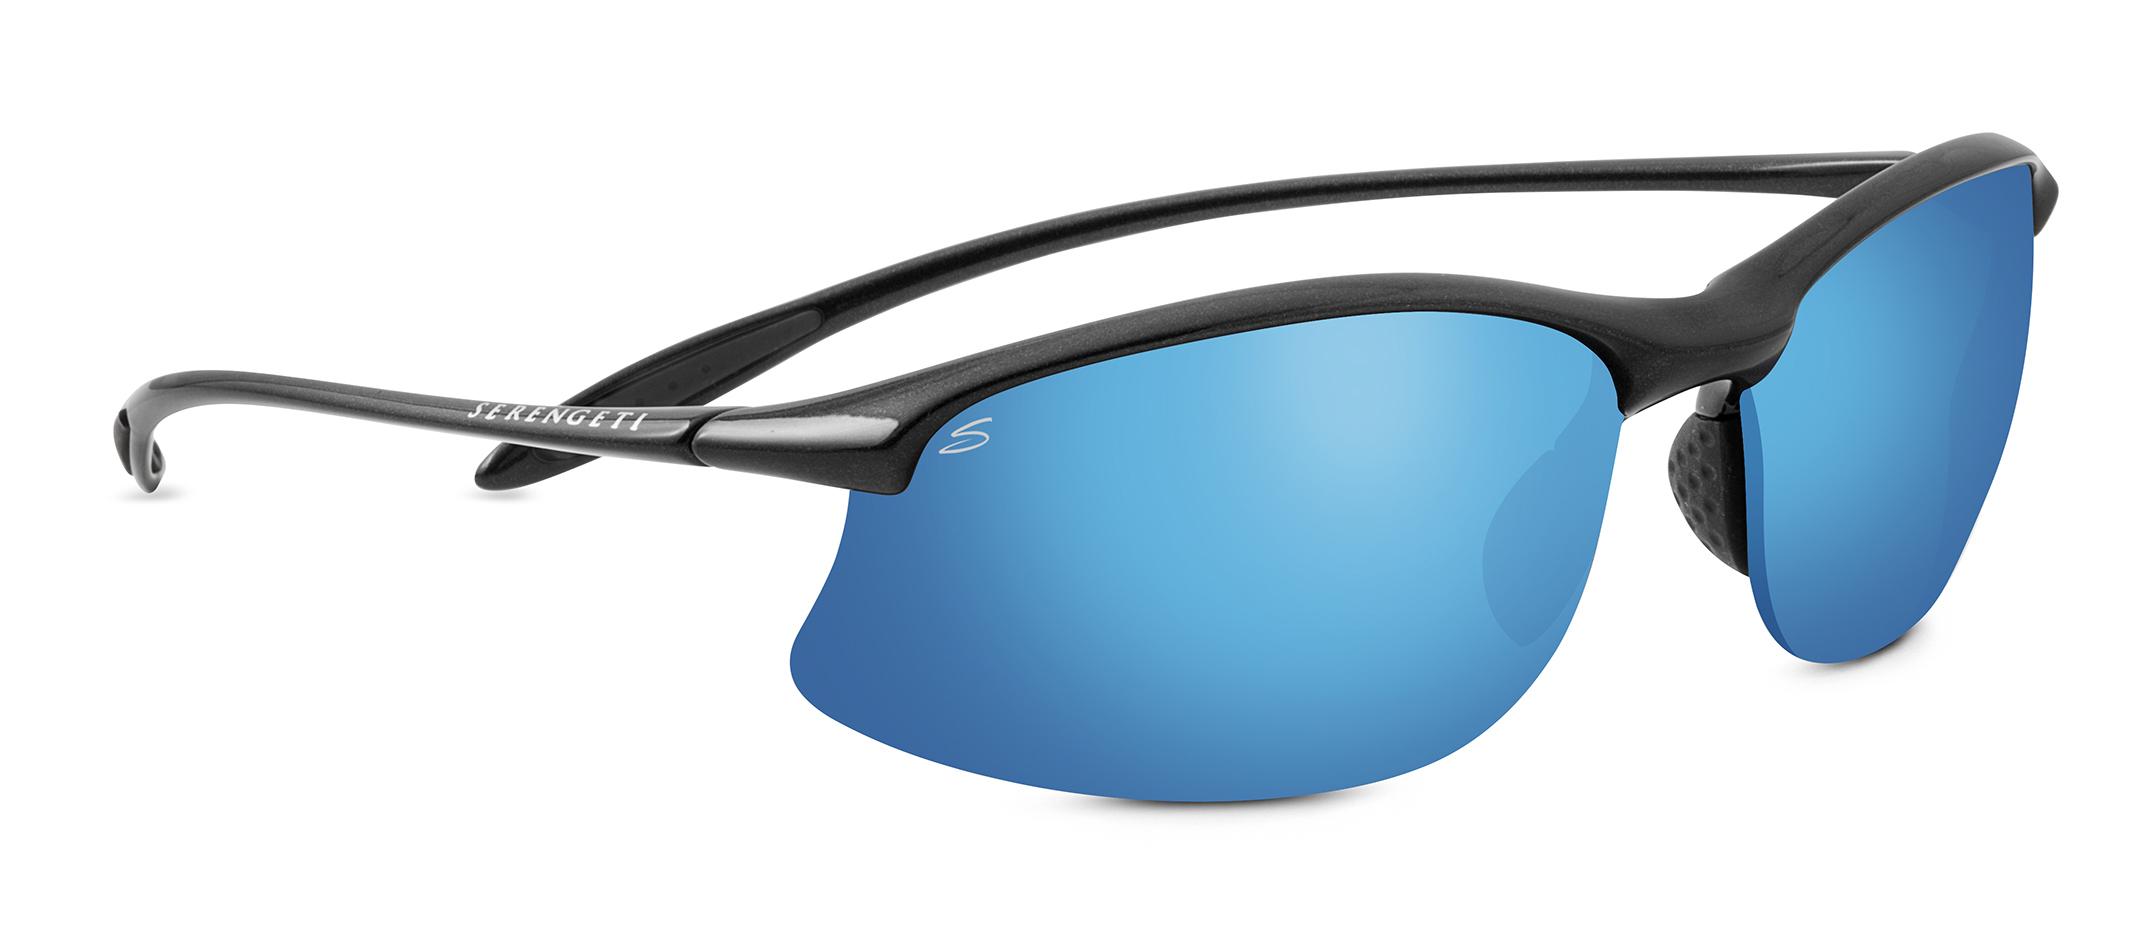 d8cbc3c3e60 Serengeti Maestrale Sunglasses